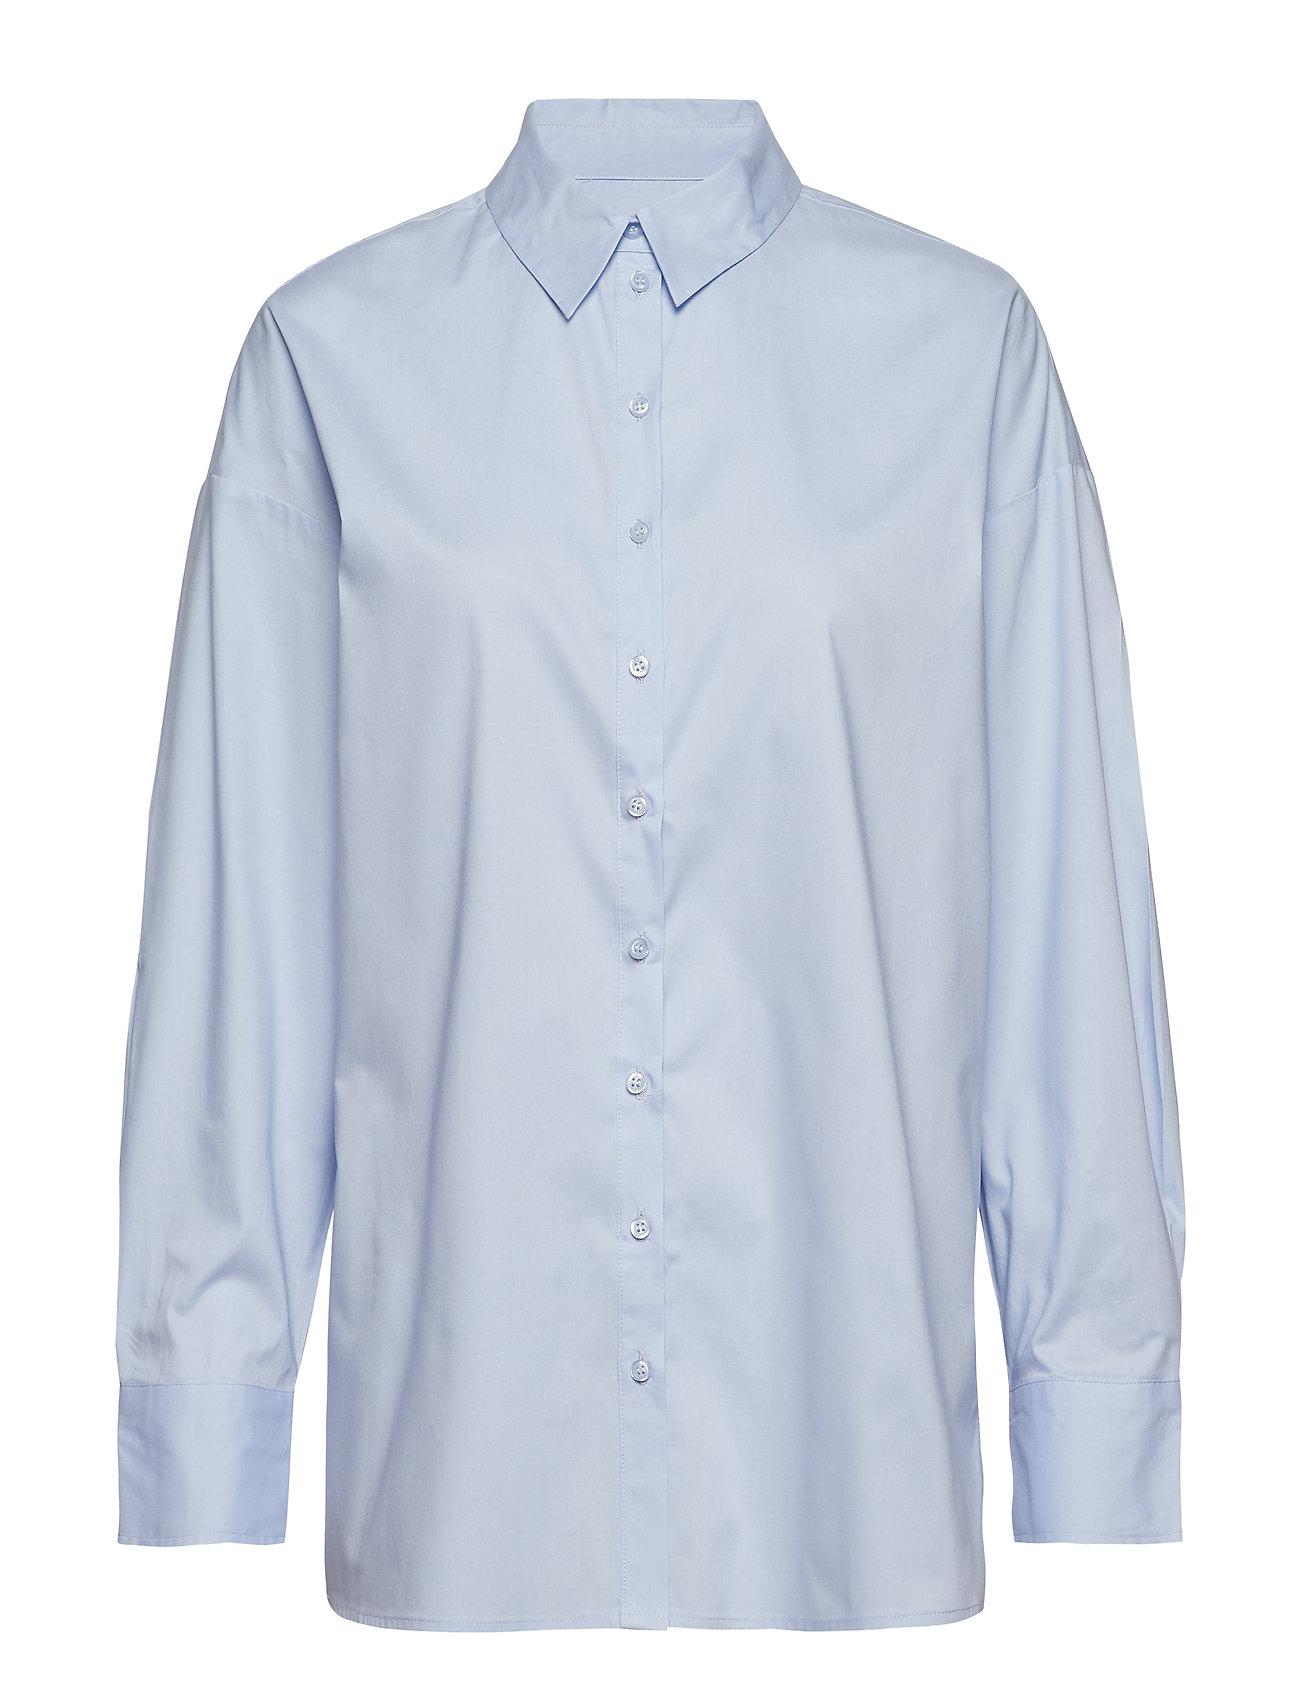 Shirt BlueGestuz Oversized Ao19xenon Ibbygz Ao19xenon Oversized Ibbygz Shirt fgb7yv6IYm